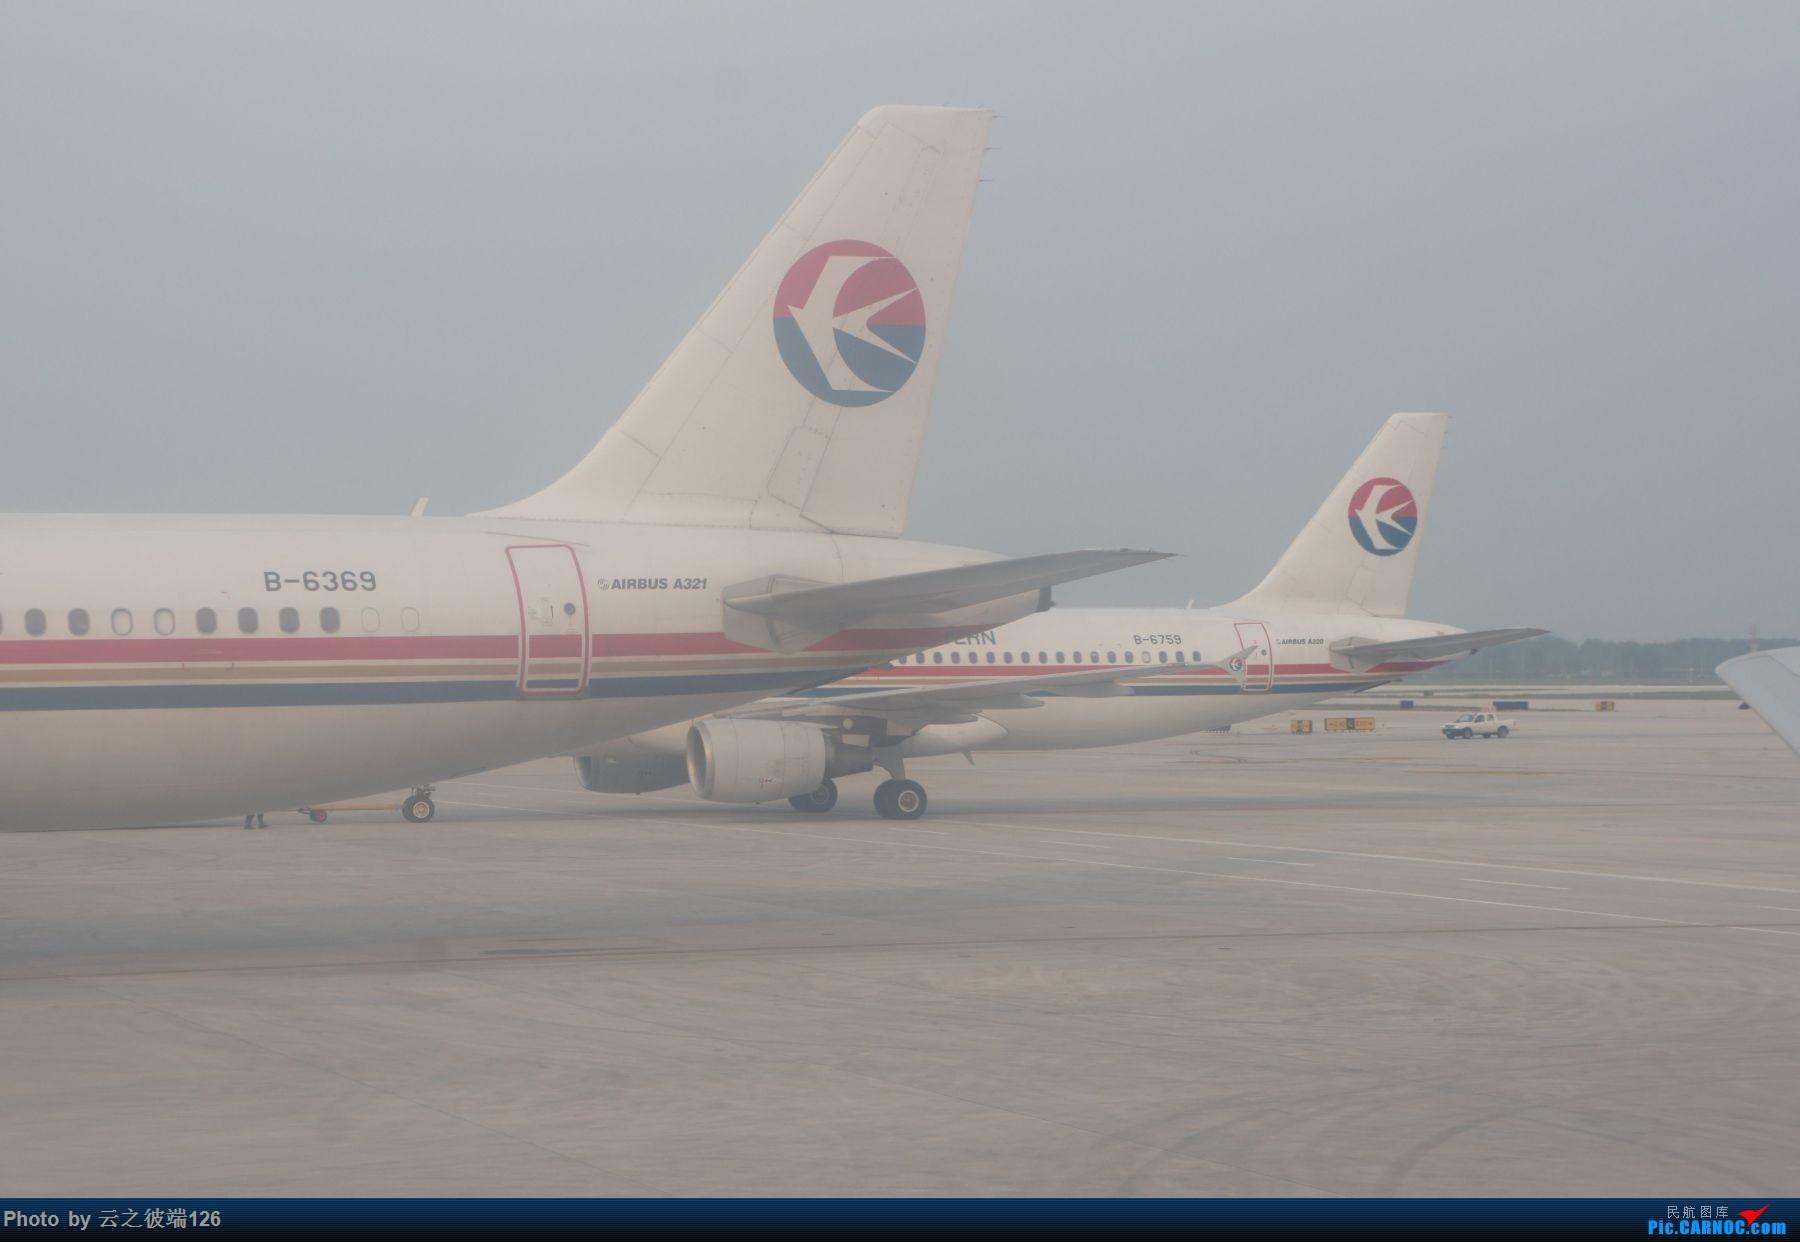 Re:[原创]迟到两年的游记 -----------NKG-SZX-NKG ZH+白菜航------ AIRBUS A320-200 B-6759 中国南京禄口国际机场